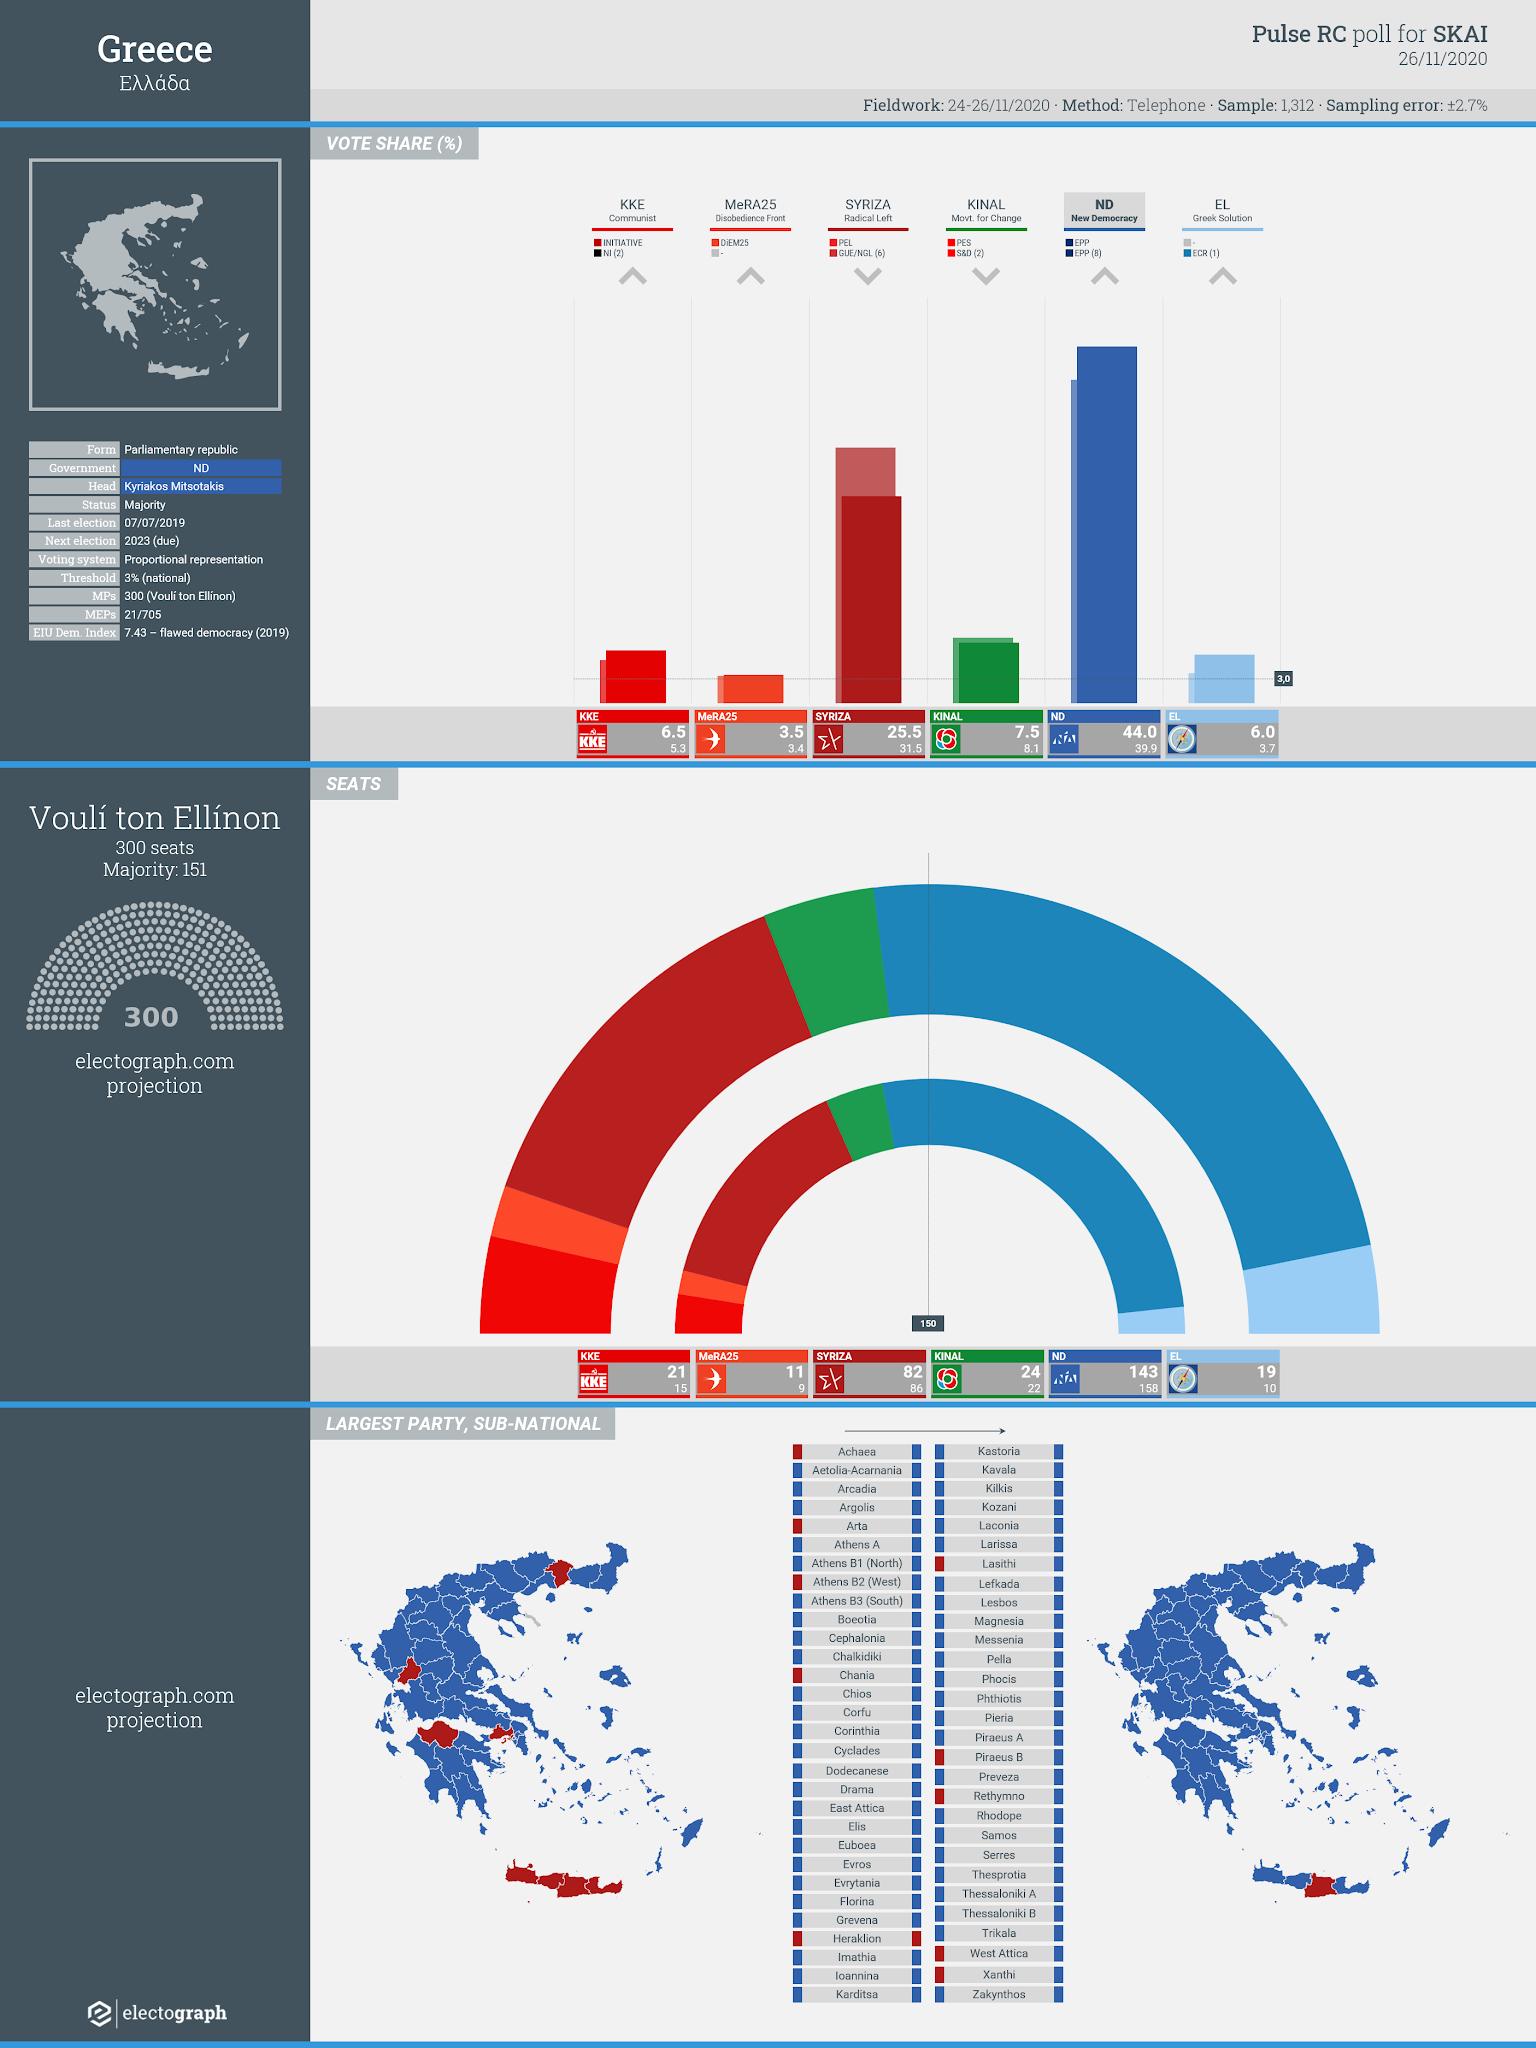 GREECE: Pulse RC poll chart for SKAI, 26 November 2020